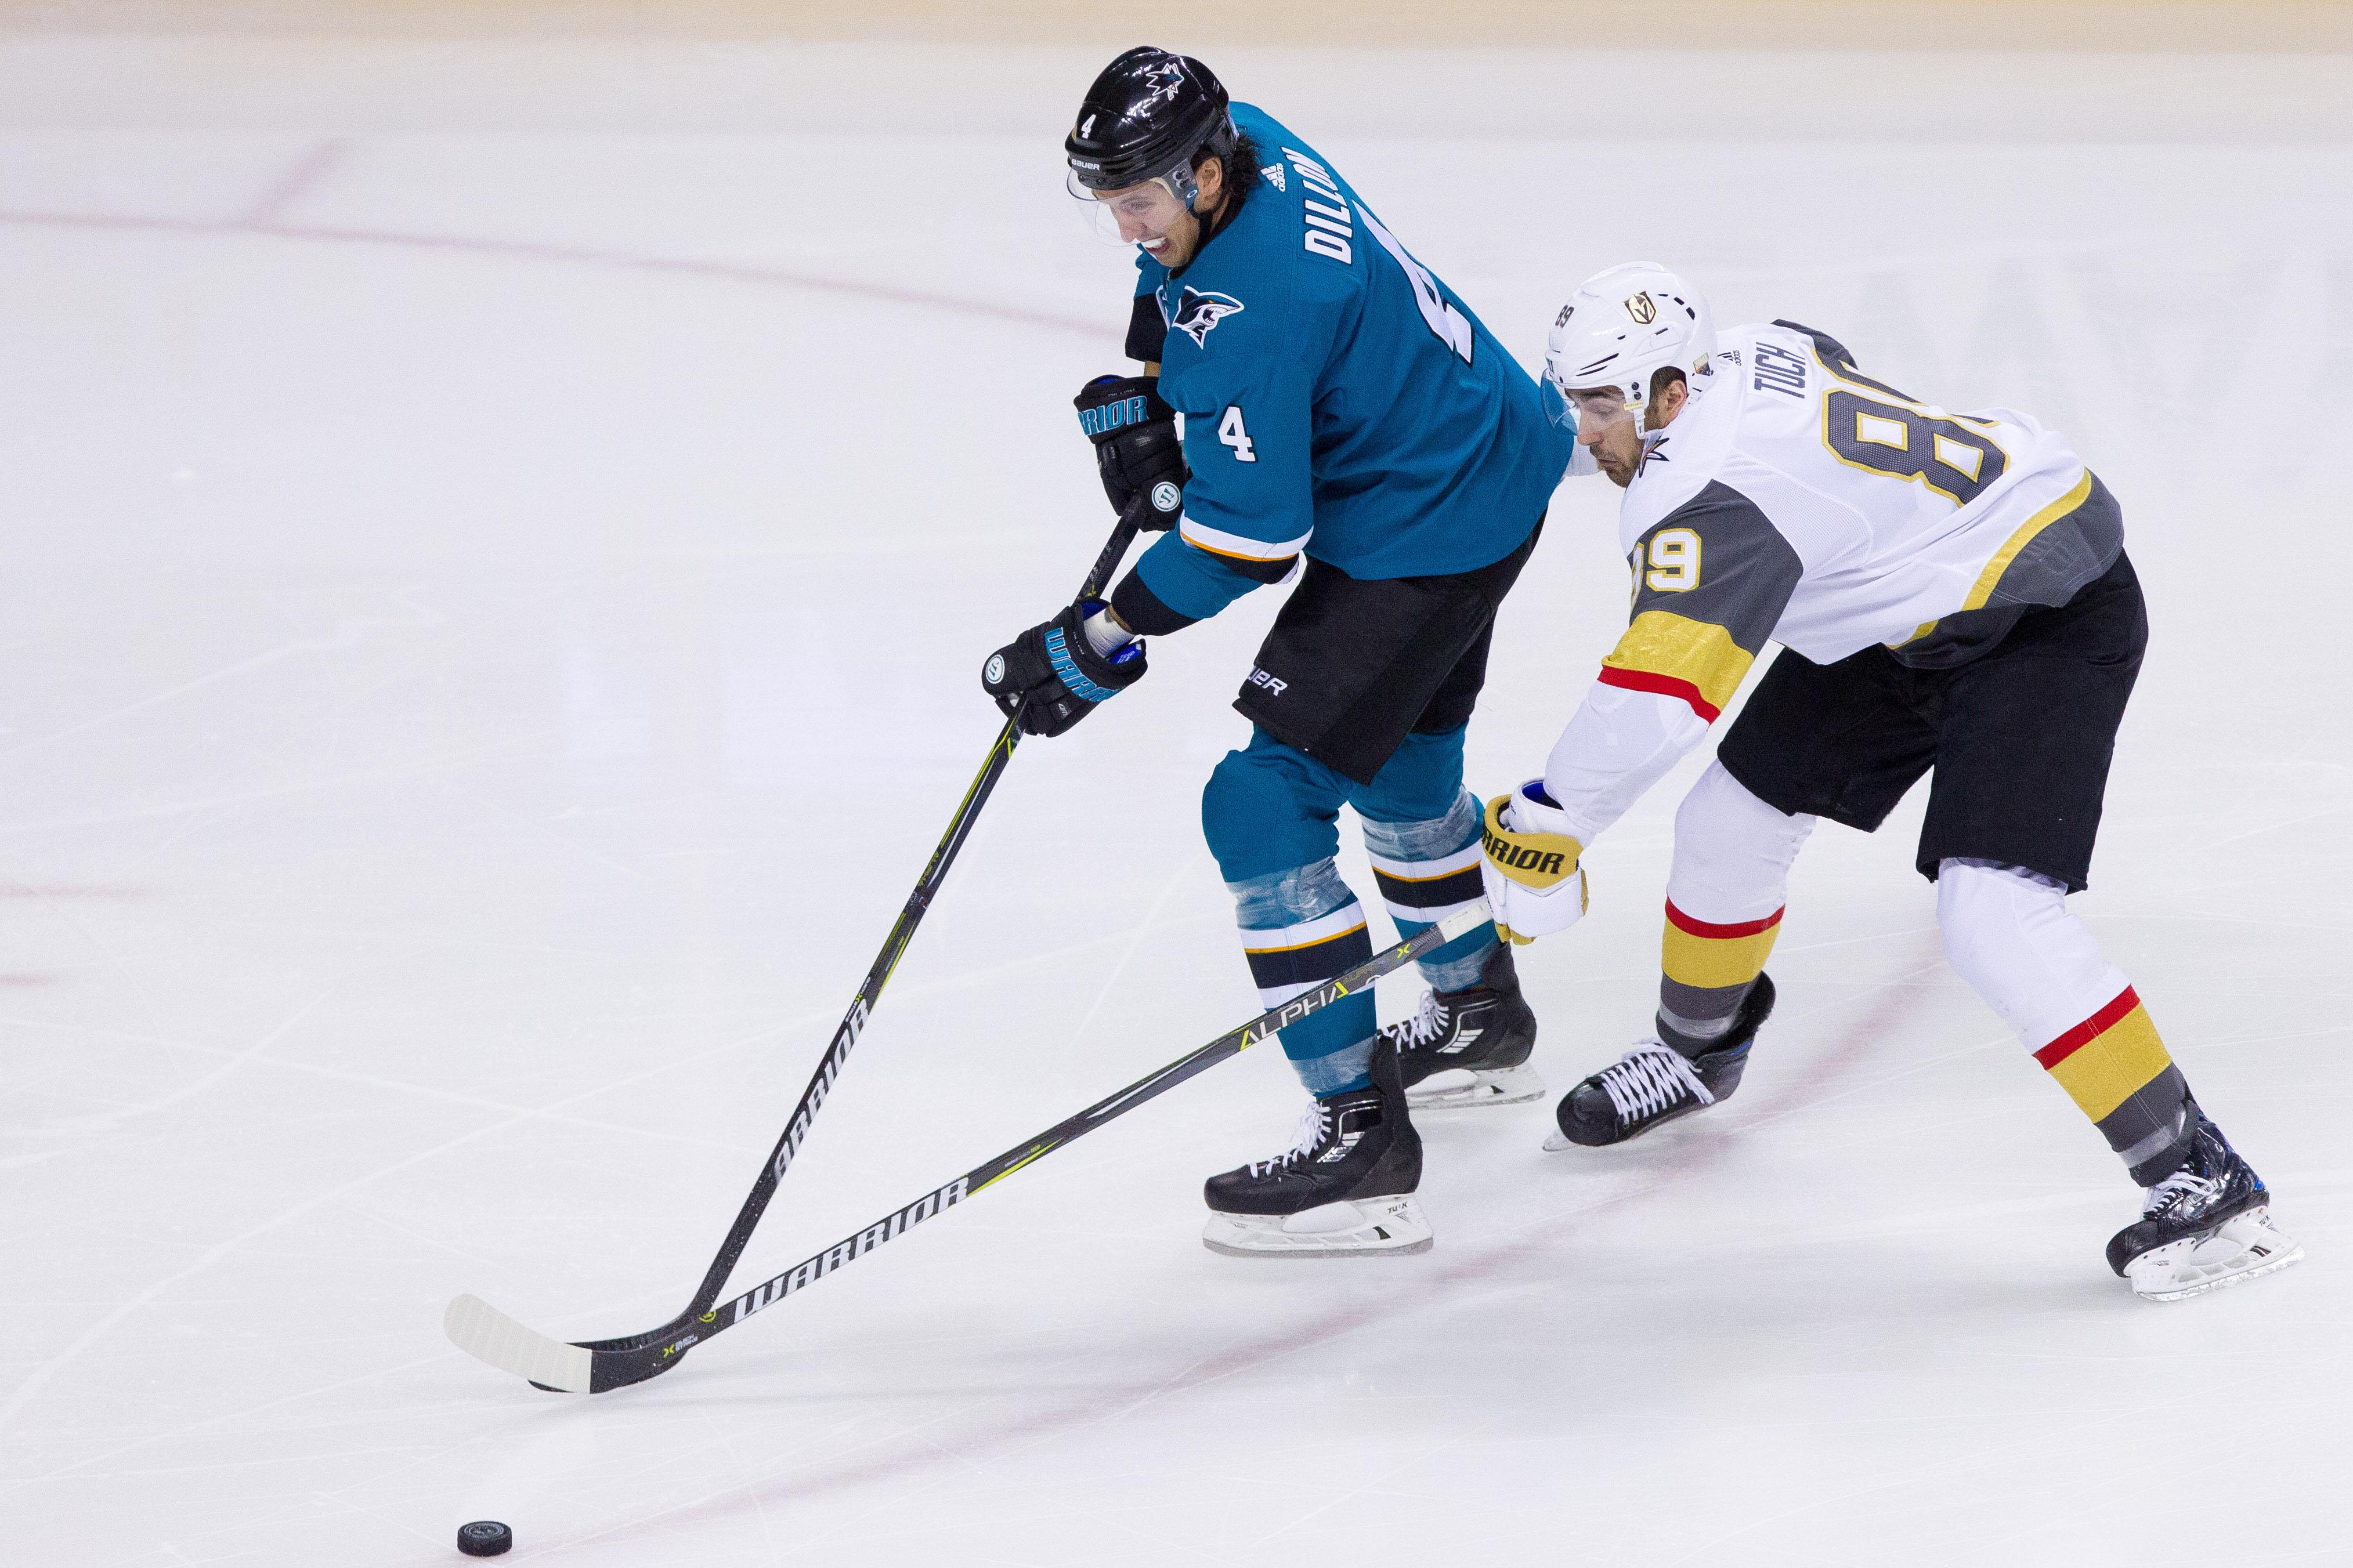 Feb 8, 2018; San Jose, CA, USA; San Jose Sharks defenseman Brendan Dillon (4) battles for the puck against Las Vegas Knights right wing Alex Tuch (89) at SAP Center at San Jose. The Knights won 5-3.